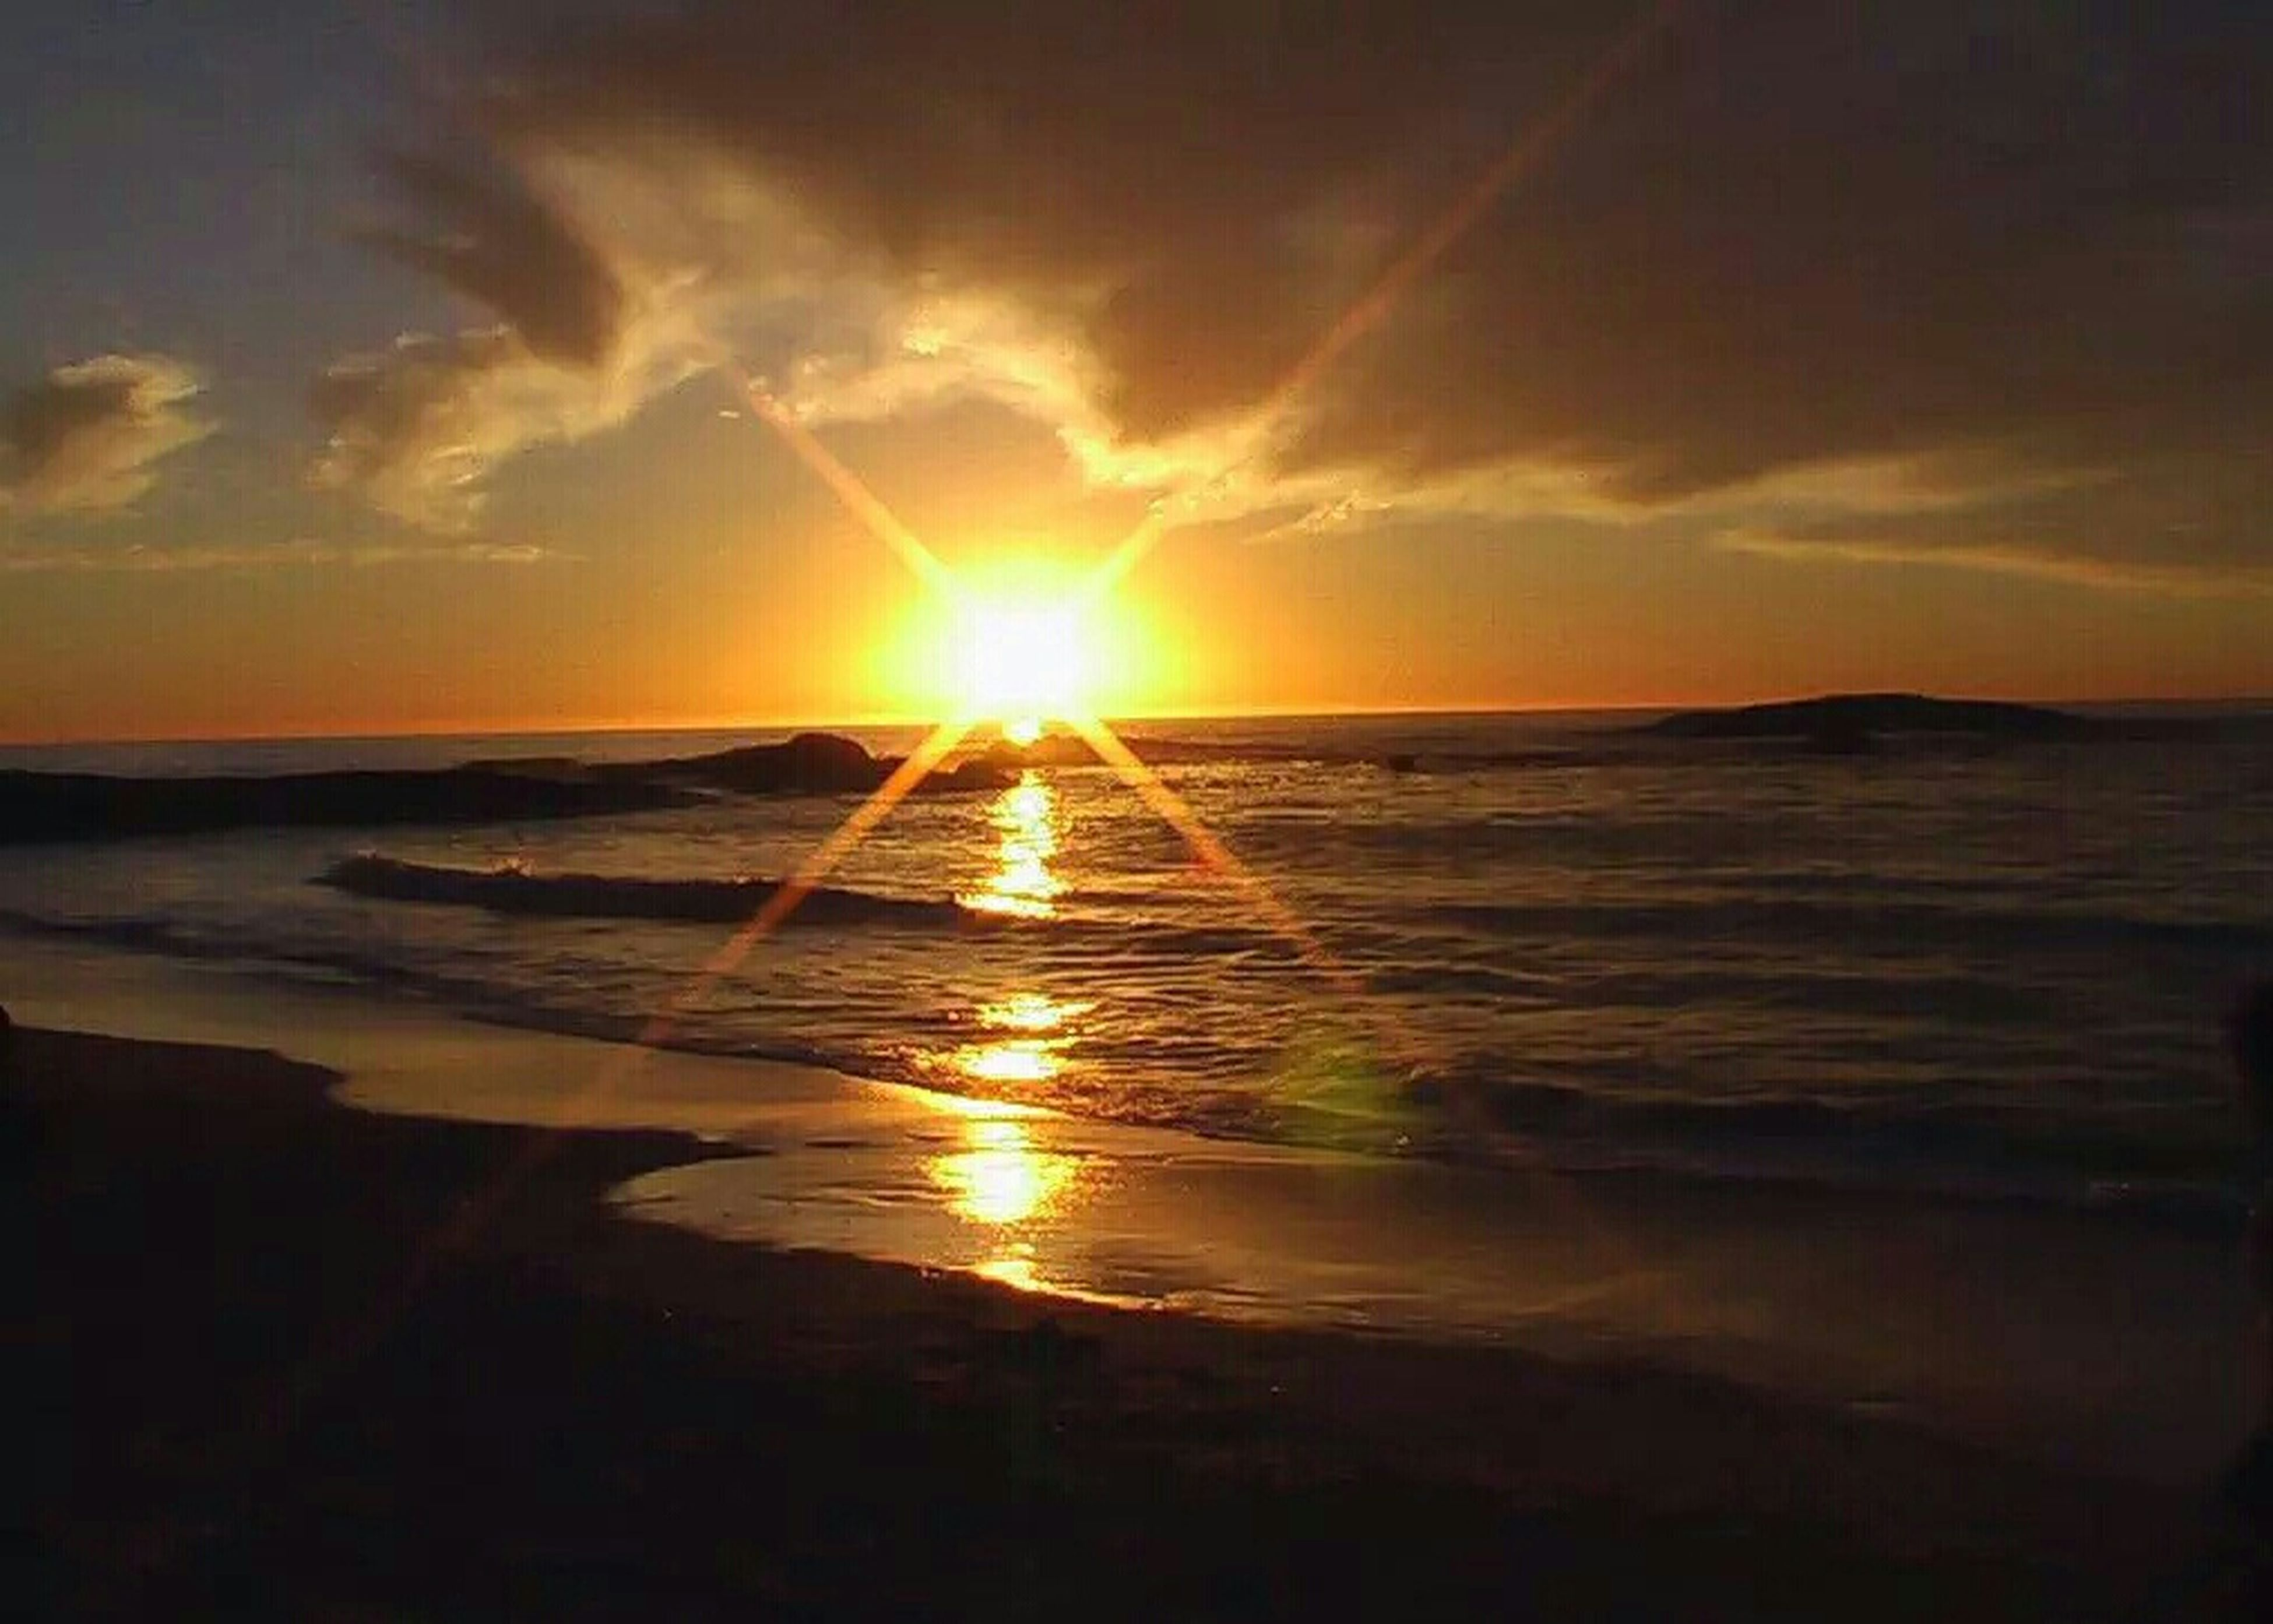 sunset, sun, water, sea, beach, scenics, tranquil scene, beauty in nature, horizon over water, tranquility, sky, shore, reflection, idyllic, orange color, sunlight, nature, sunbeam, cloud - sky, sand